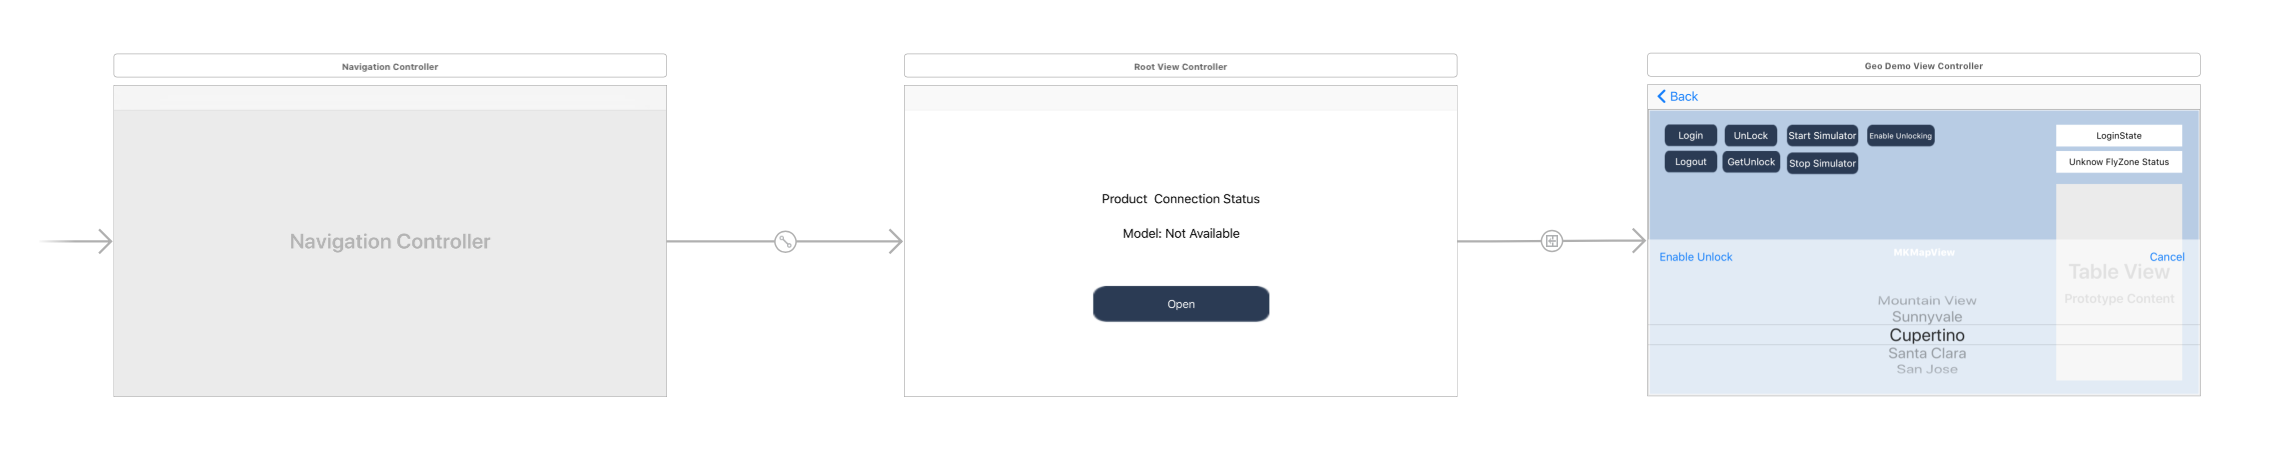 DJI GEO System Tutorial - DJI Mobile SDK Documentation